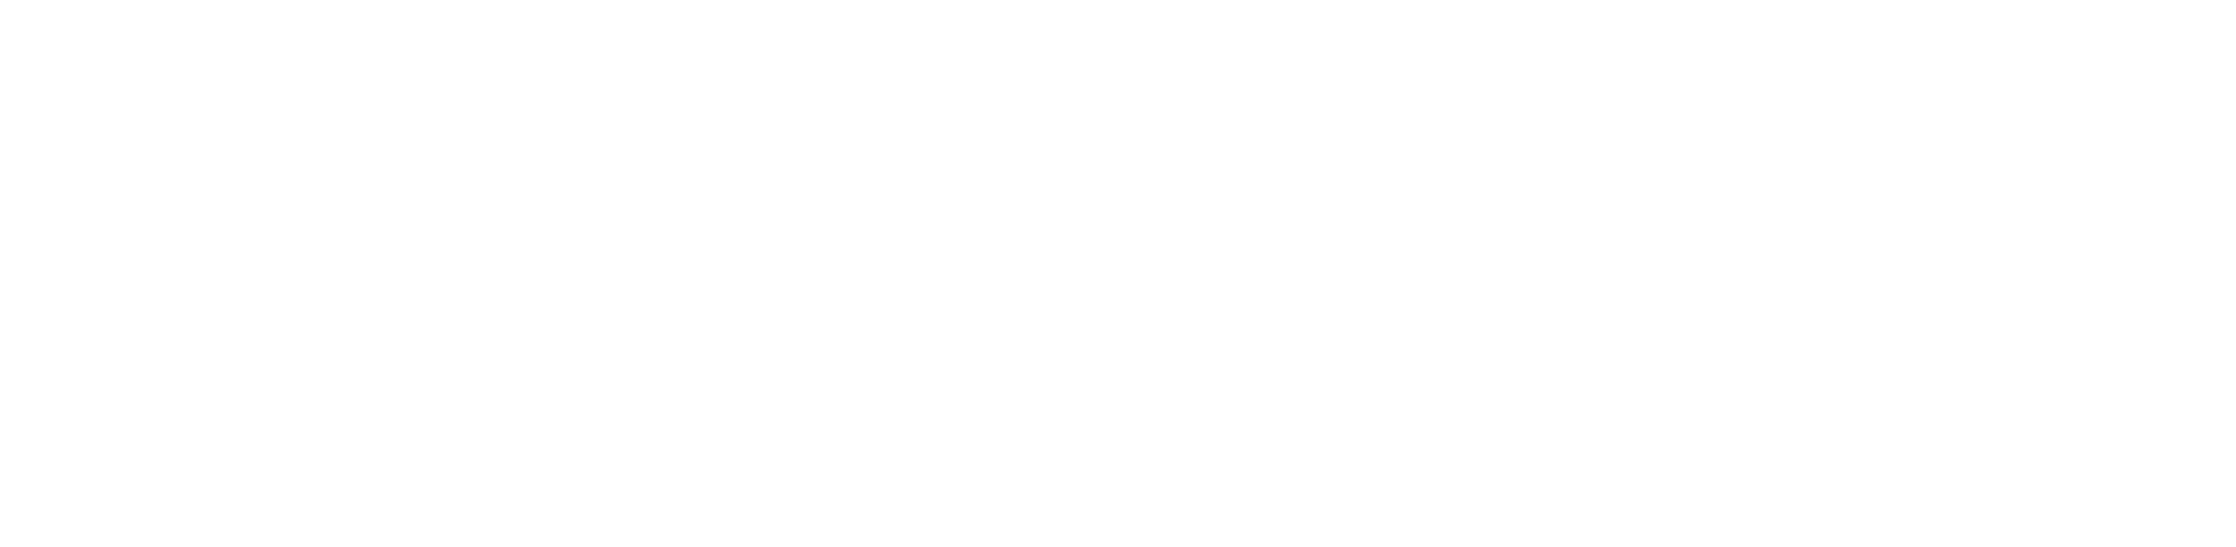 H. Maußen - GmbH & Co. KG